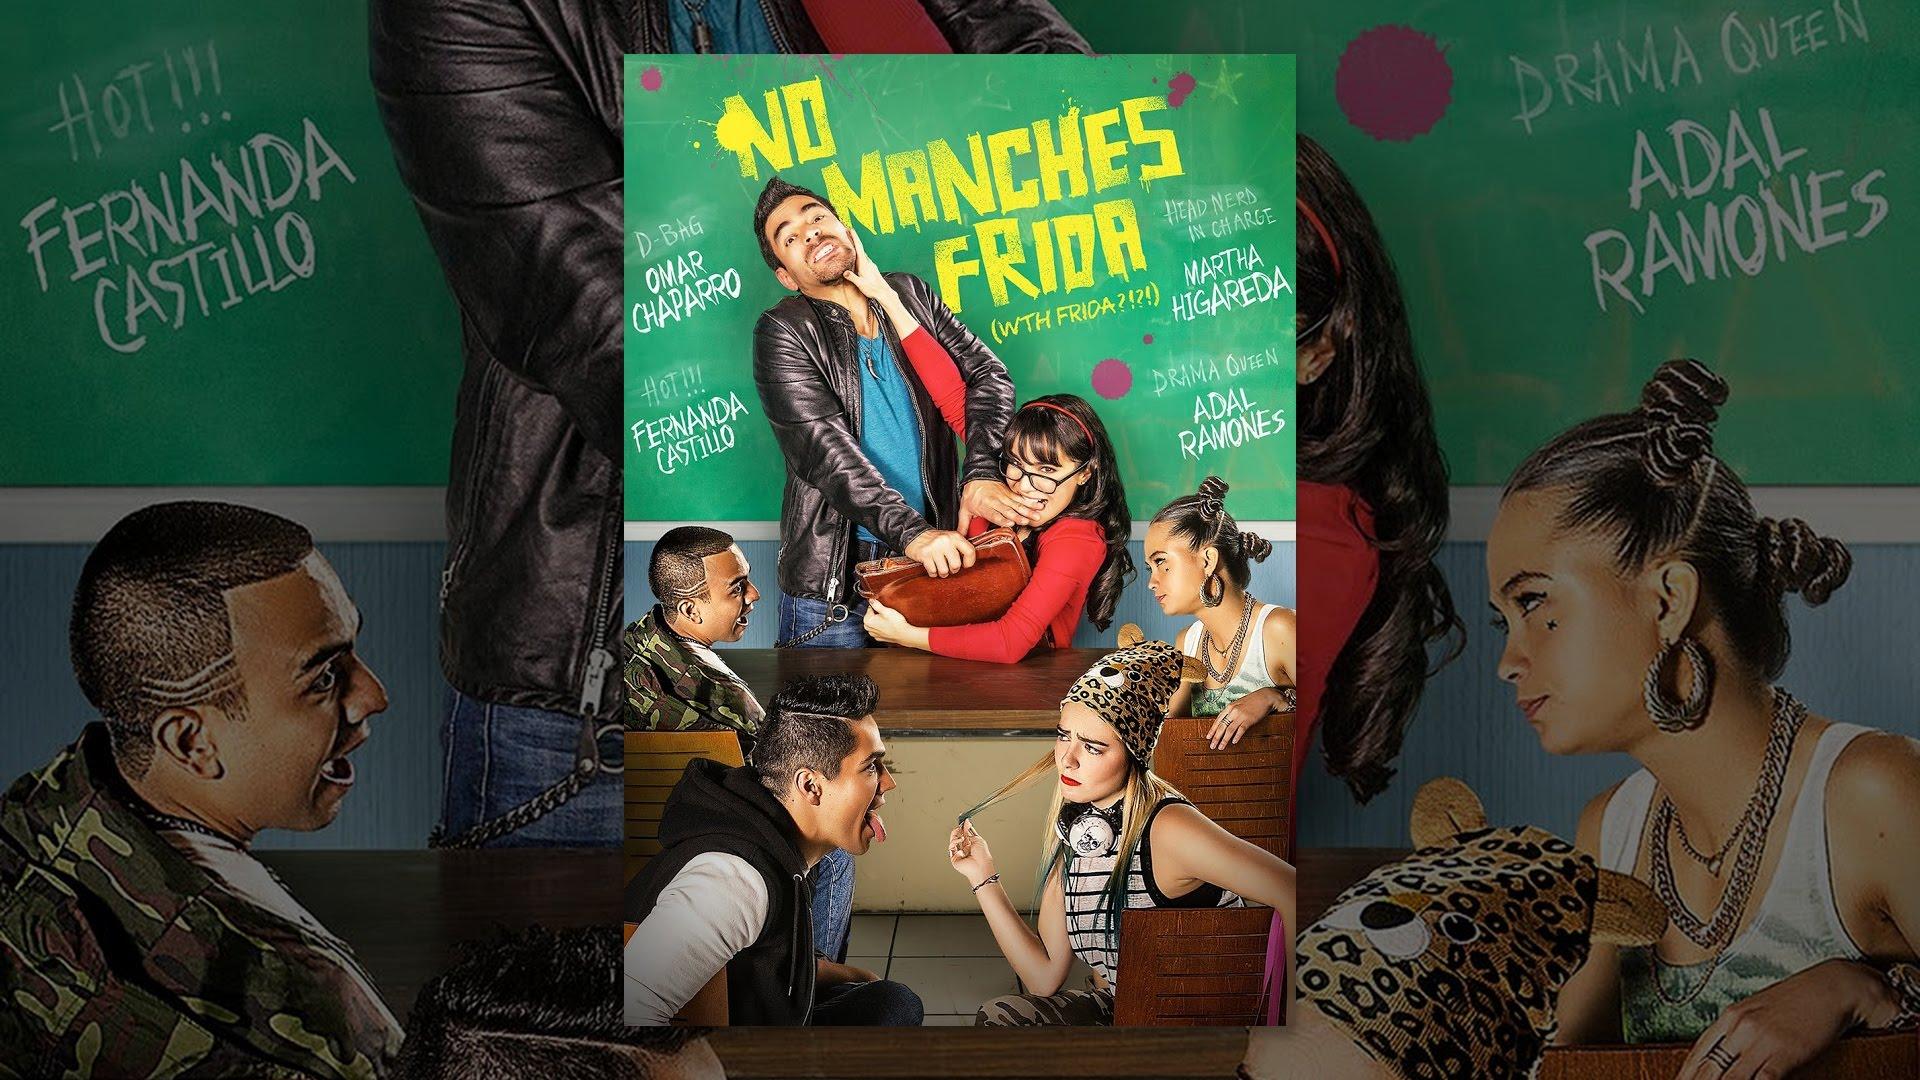 Ver No Manches Frida en Español